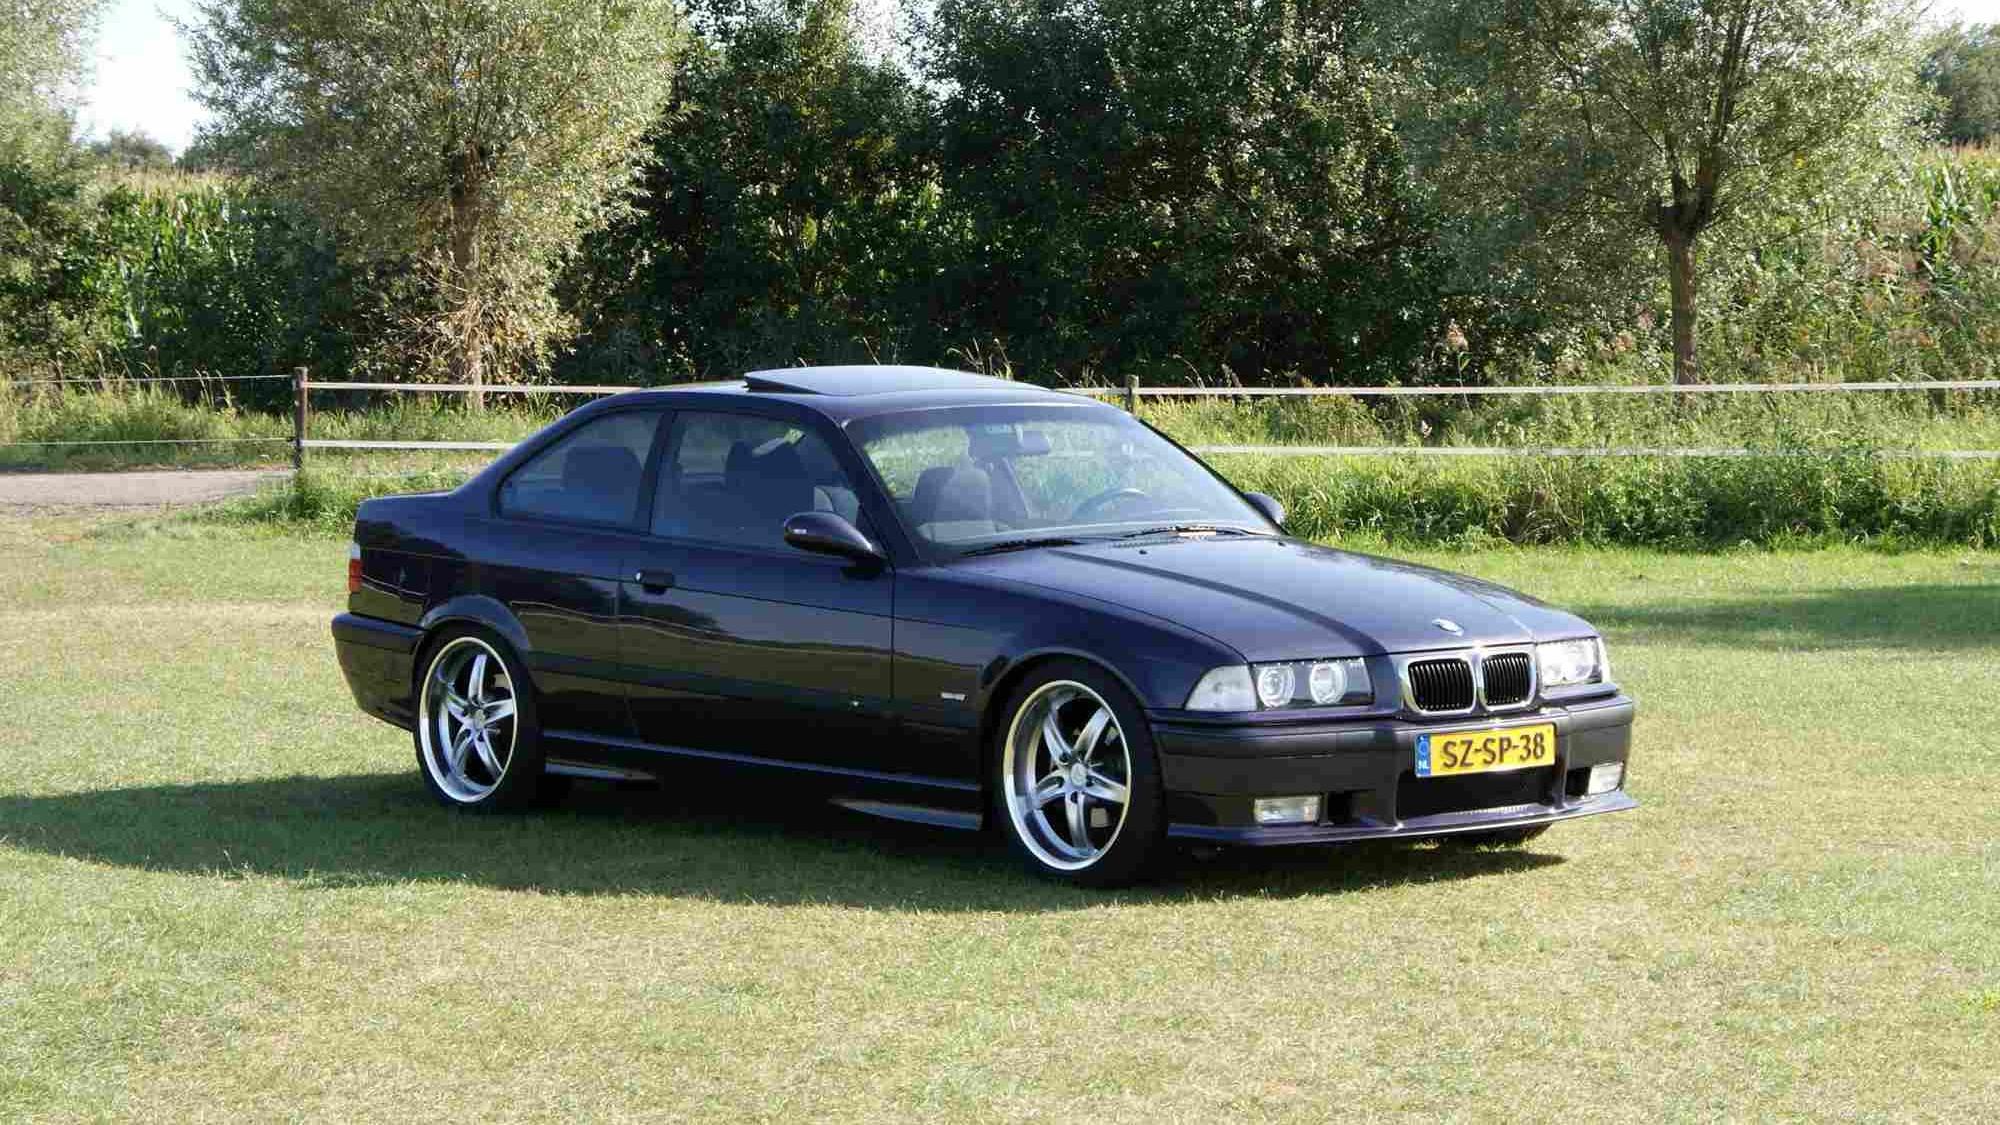 Elmark-online-automotive-content-marketing-1998-BMW-E36-328i-Coupe-2000x1390